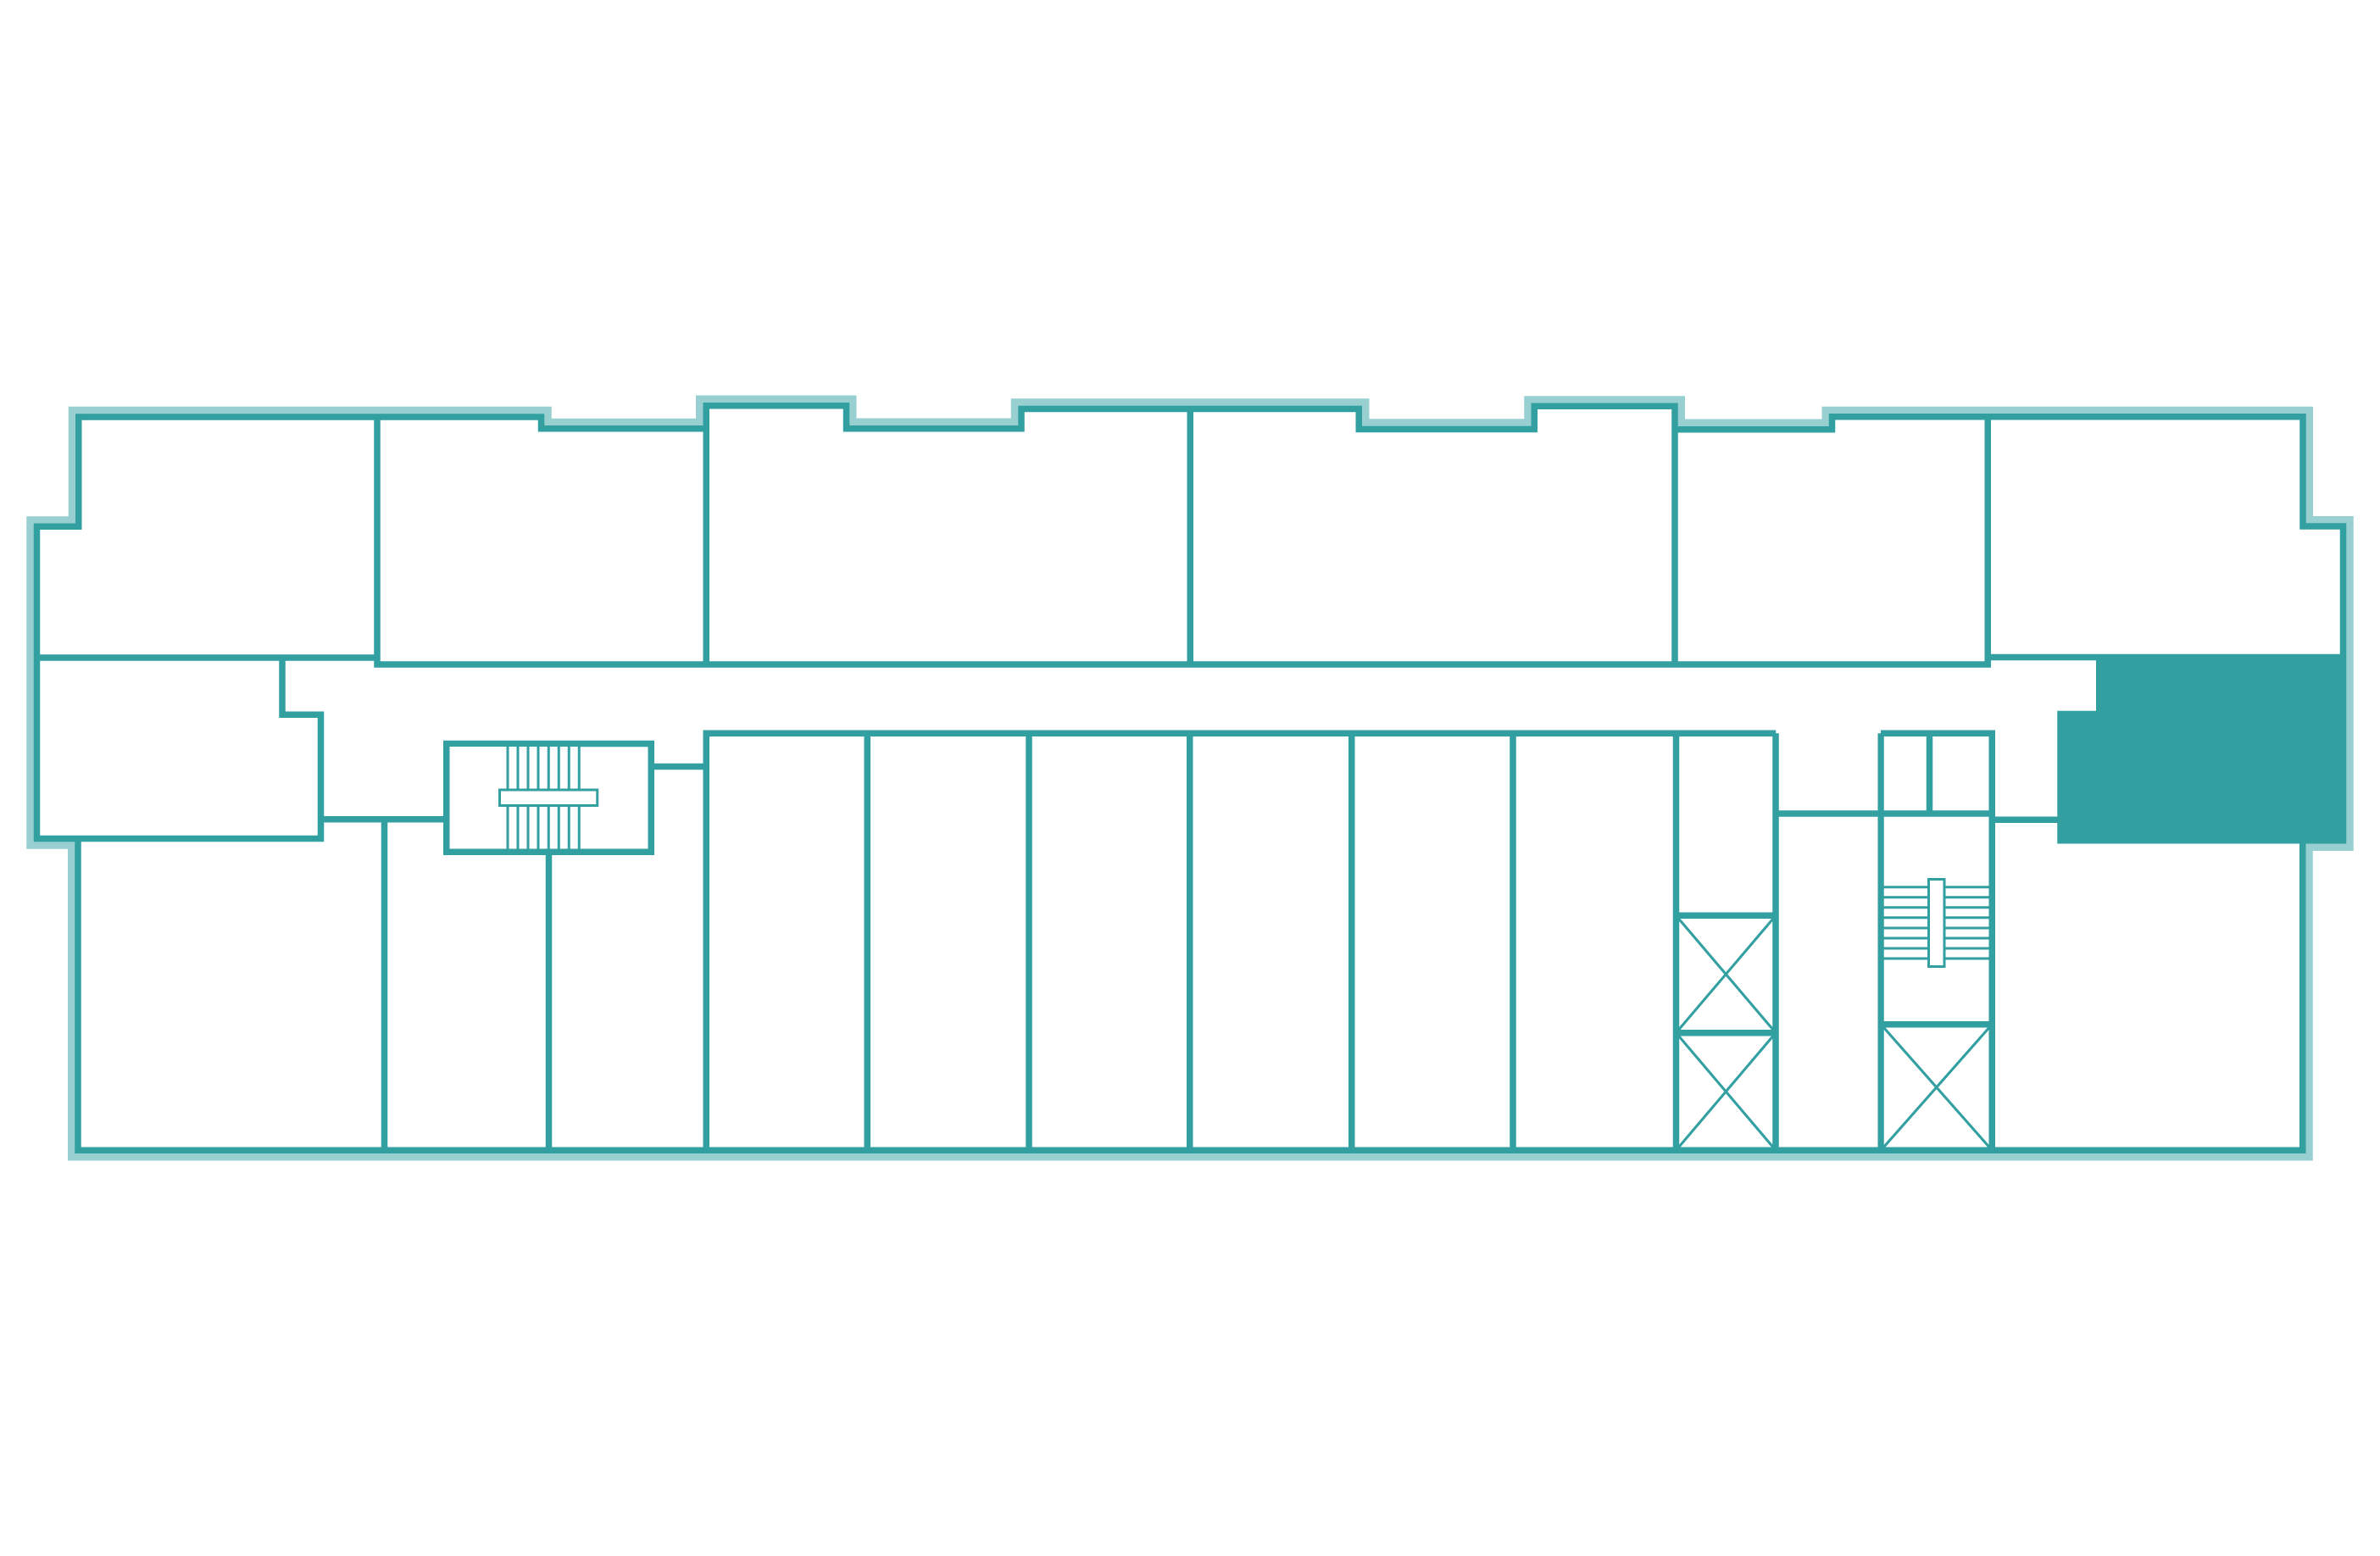 floorplan image of unit image 0518